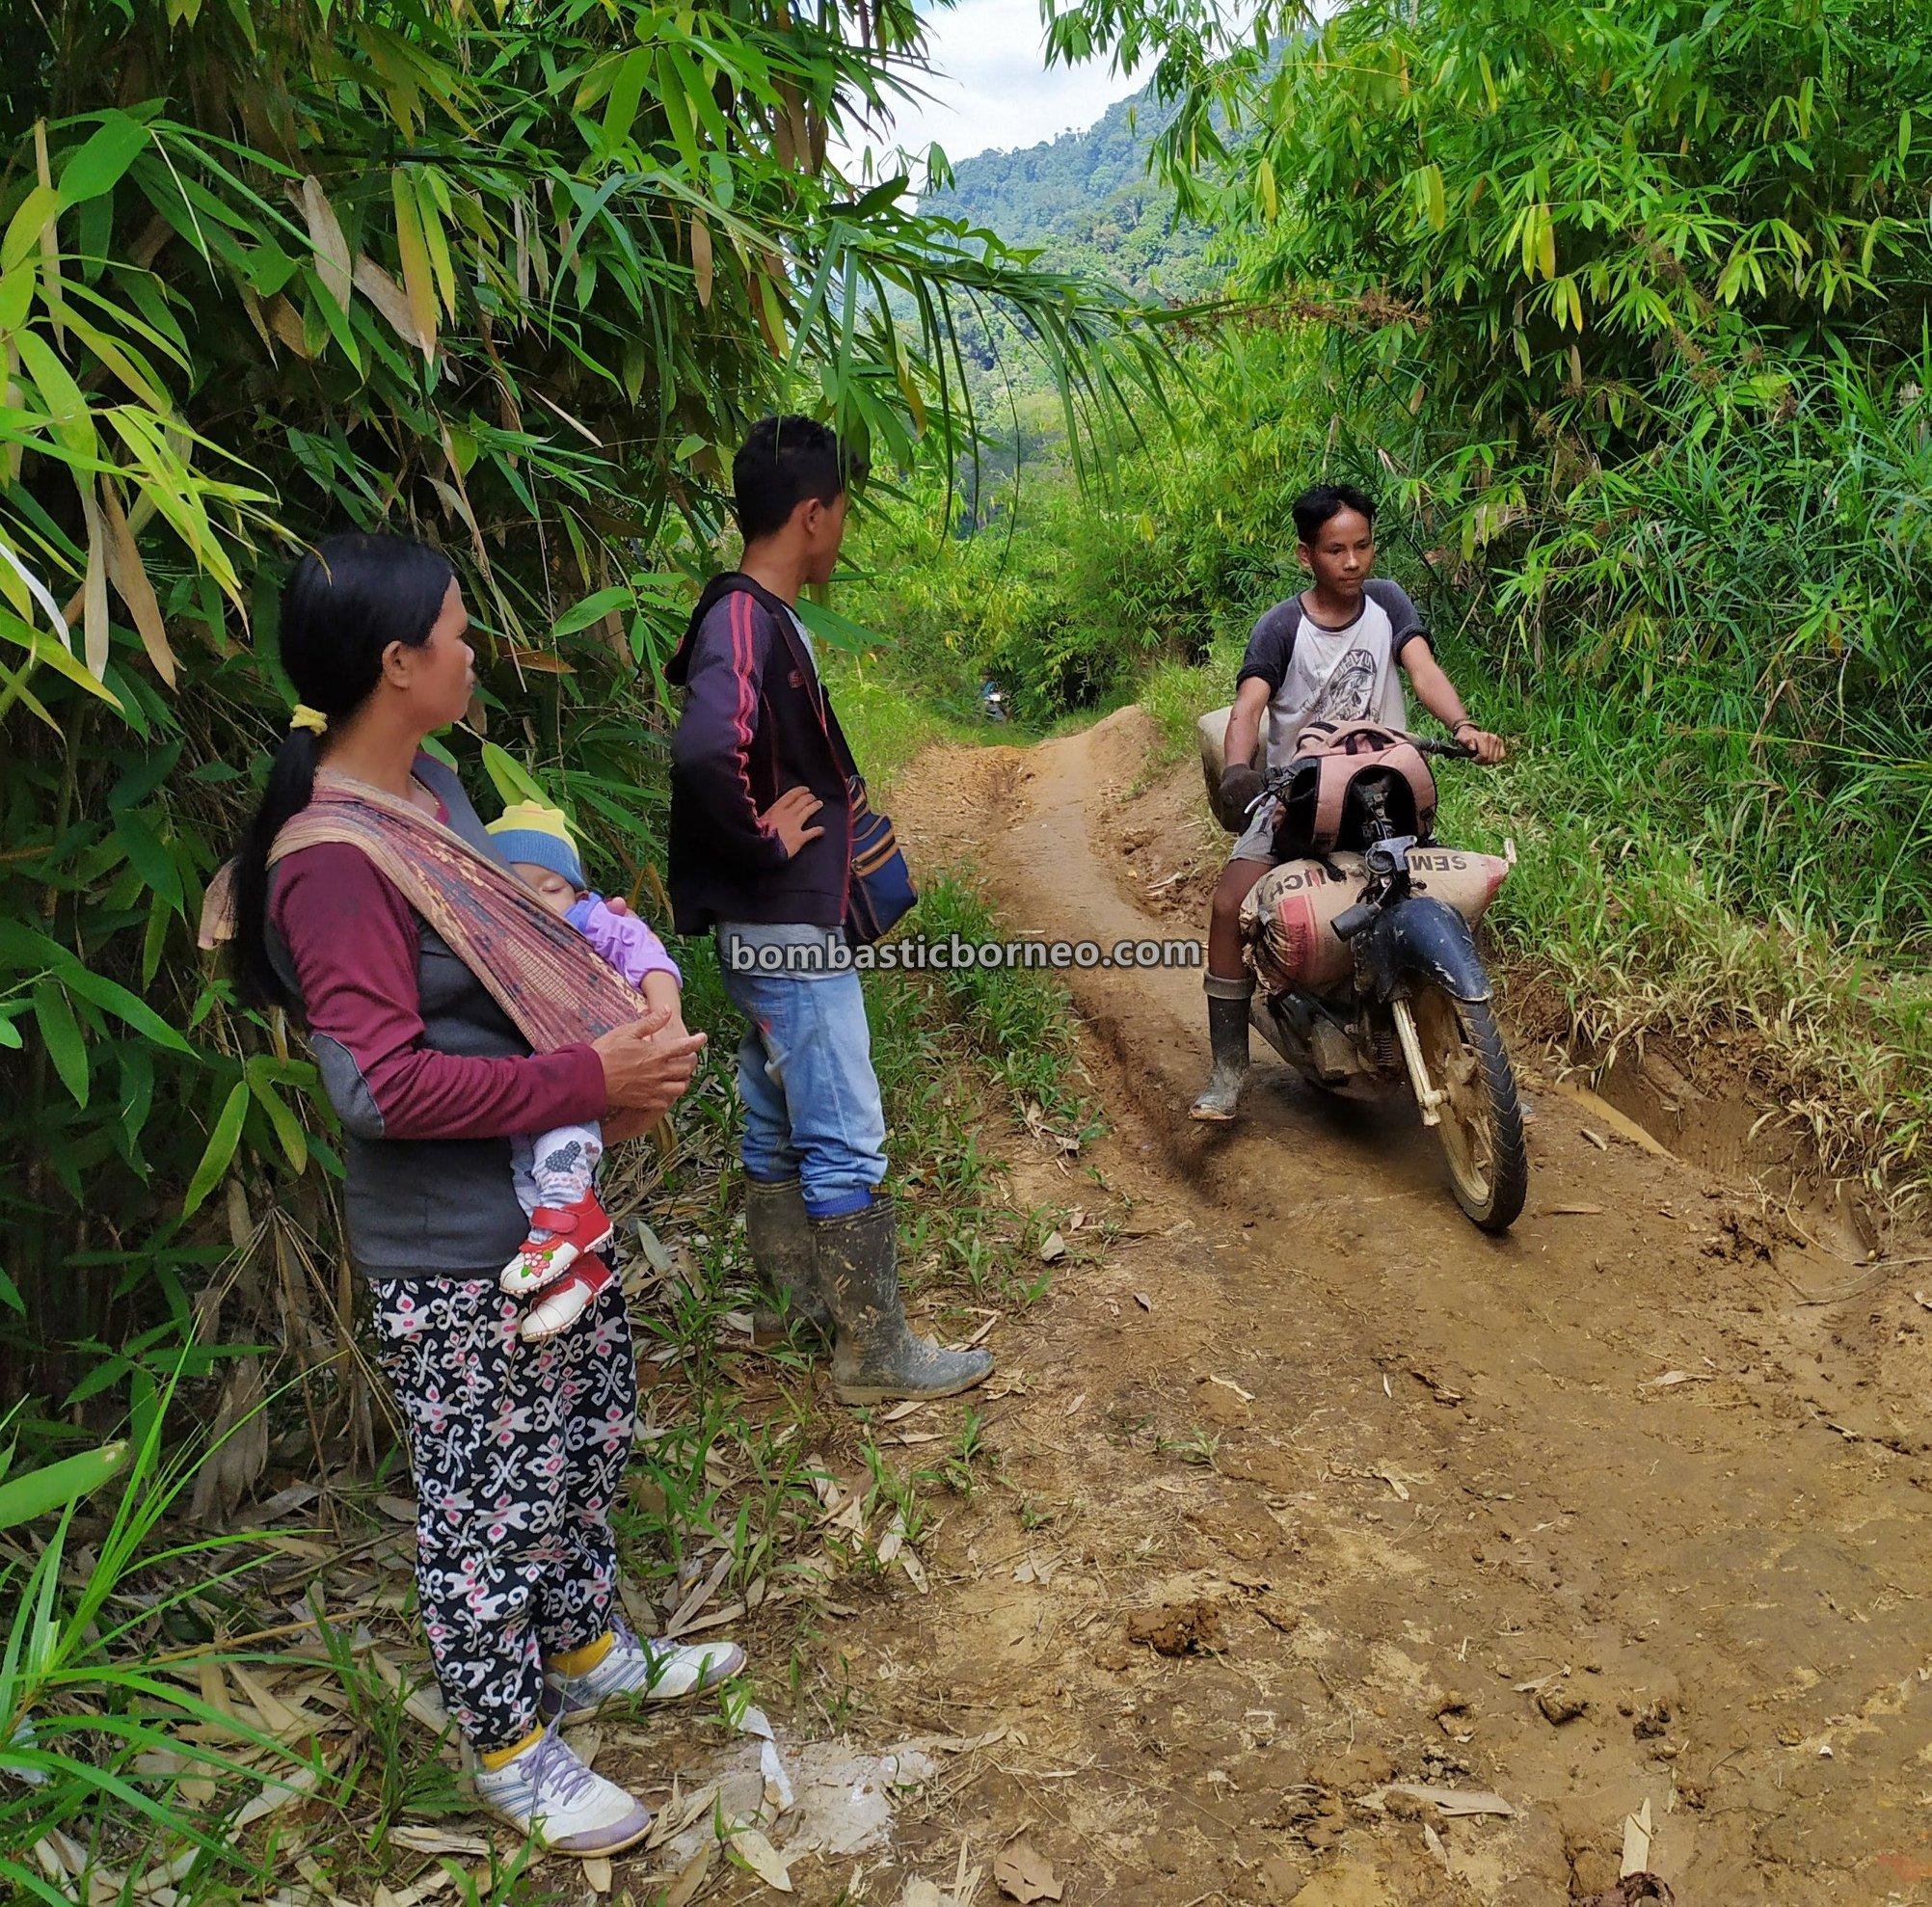 Dusun Medeng, adventure, motorbike ride, authentic, exploration, Bengkayang, Indonesia, Dayak Bidayuh, Highland, Tourism, travel guide, Trans Border, Borneo, 印尼西加里曼丹, 孟加映原住民部落